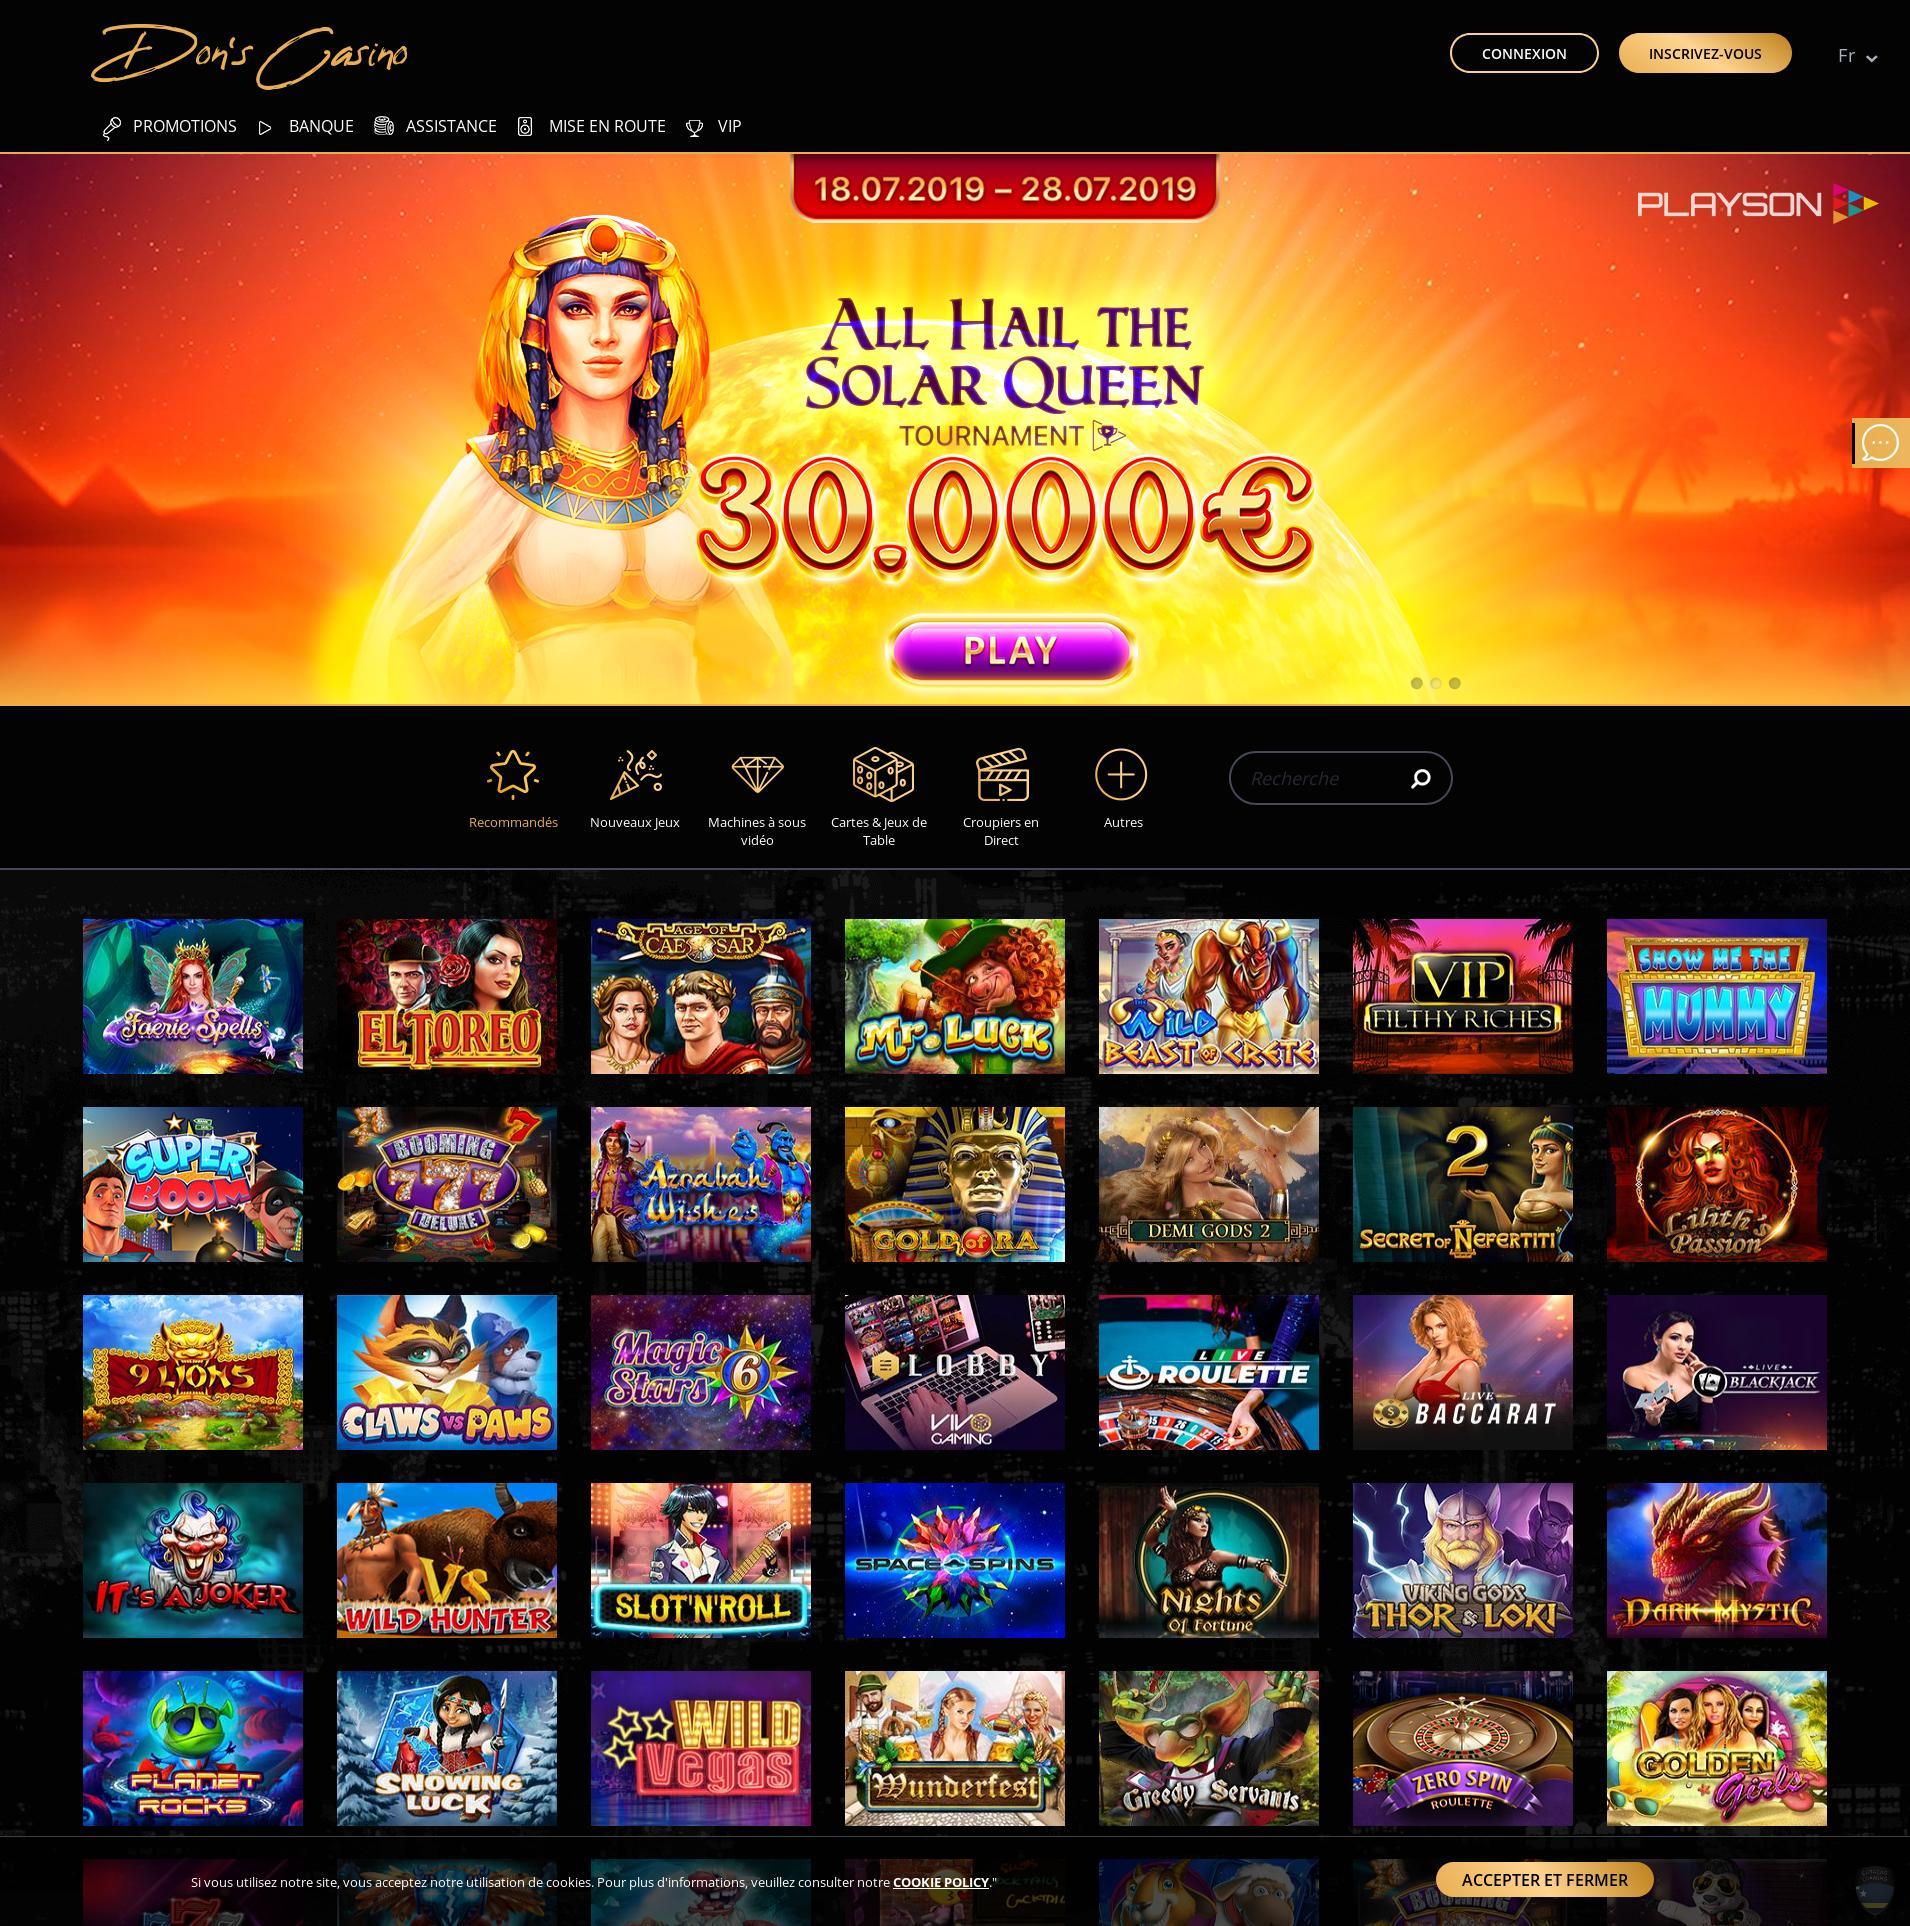 Casino screen Lobby 2019-10-19 for France